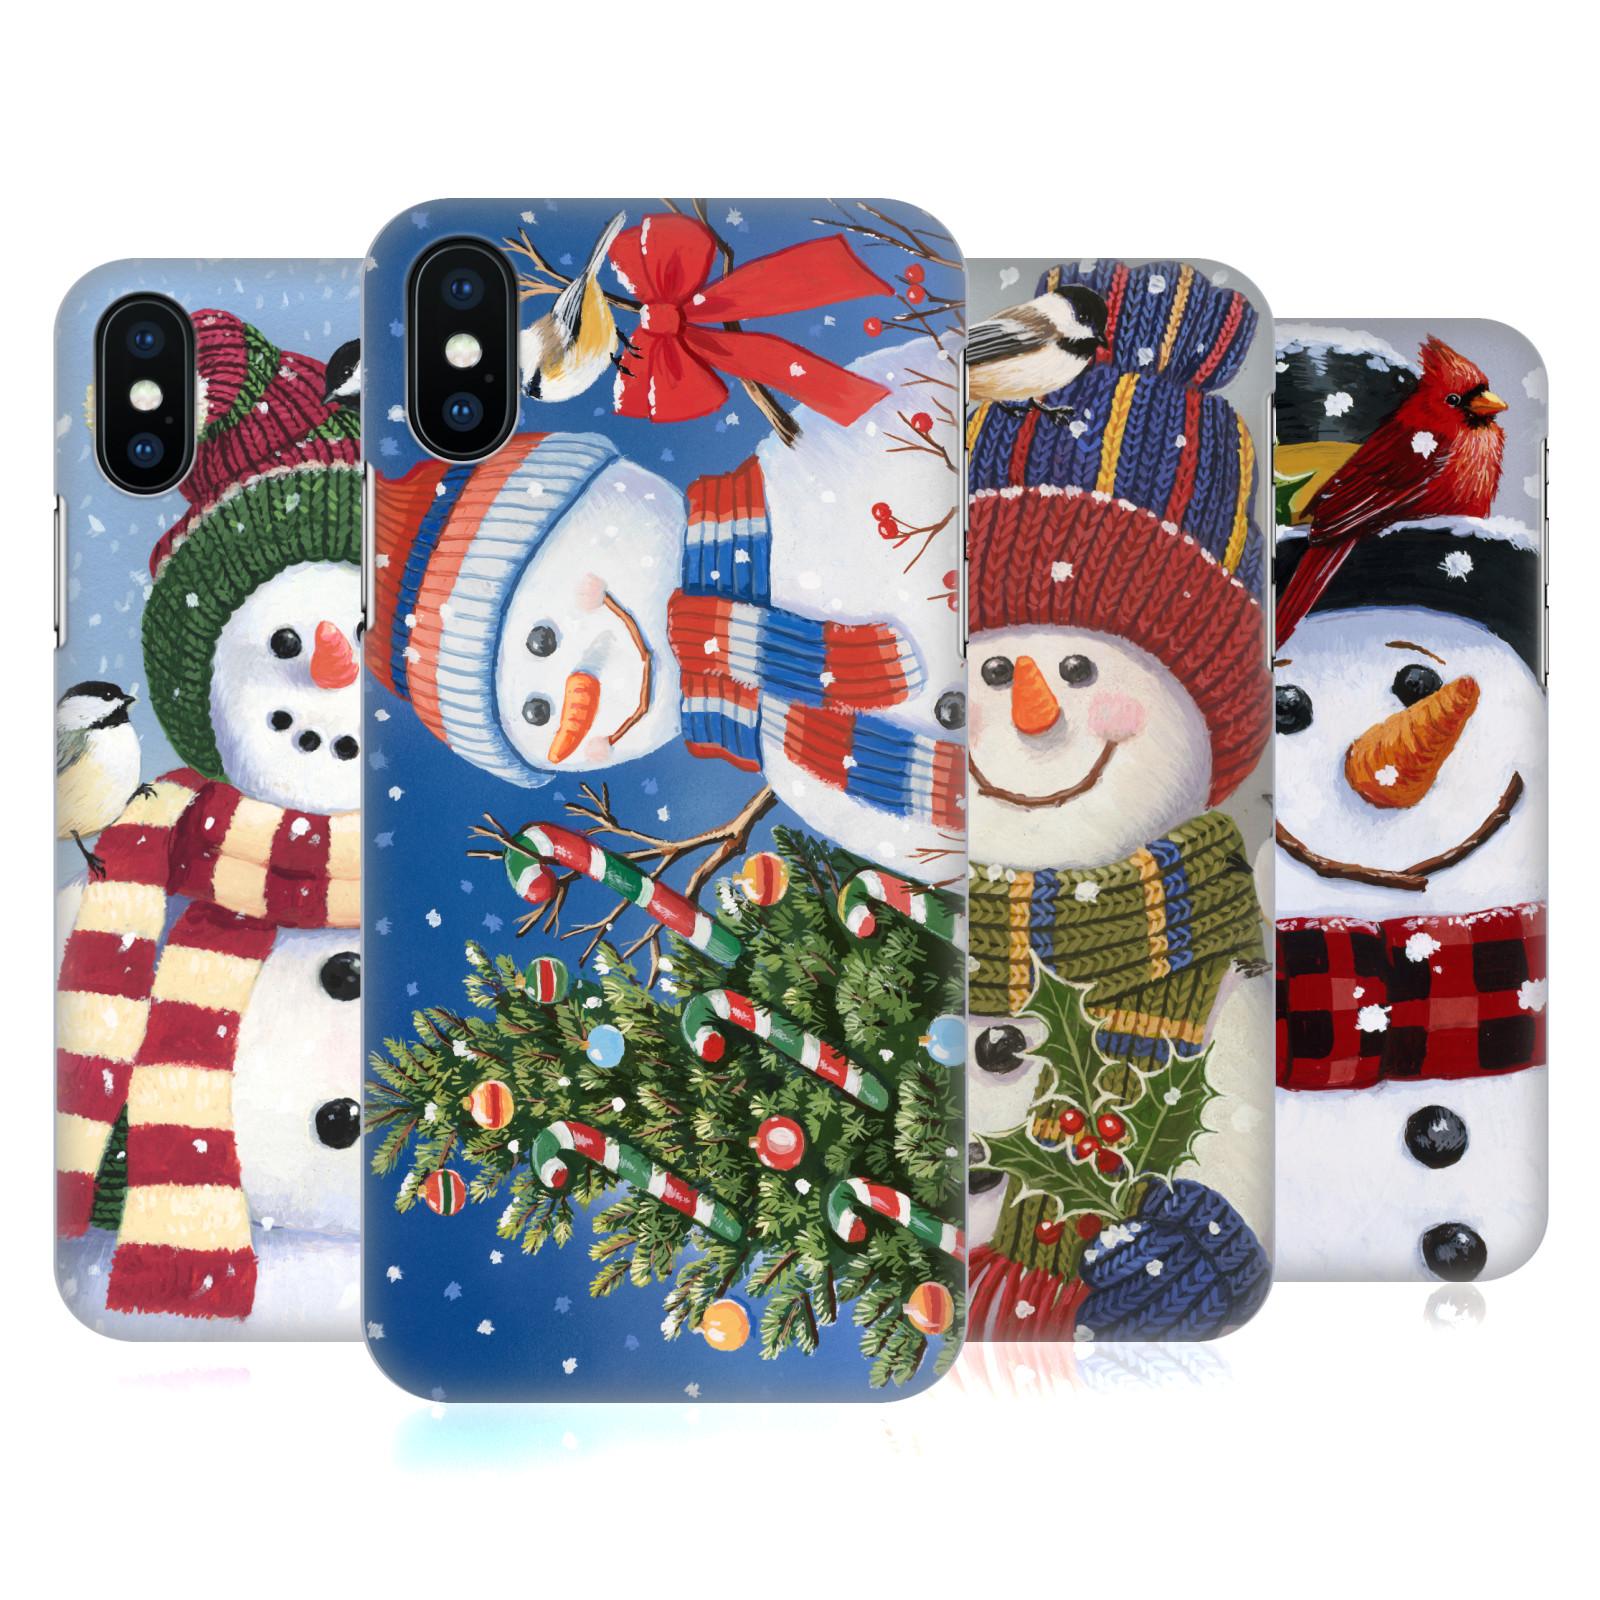 Christmas Mix Snowman